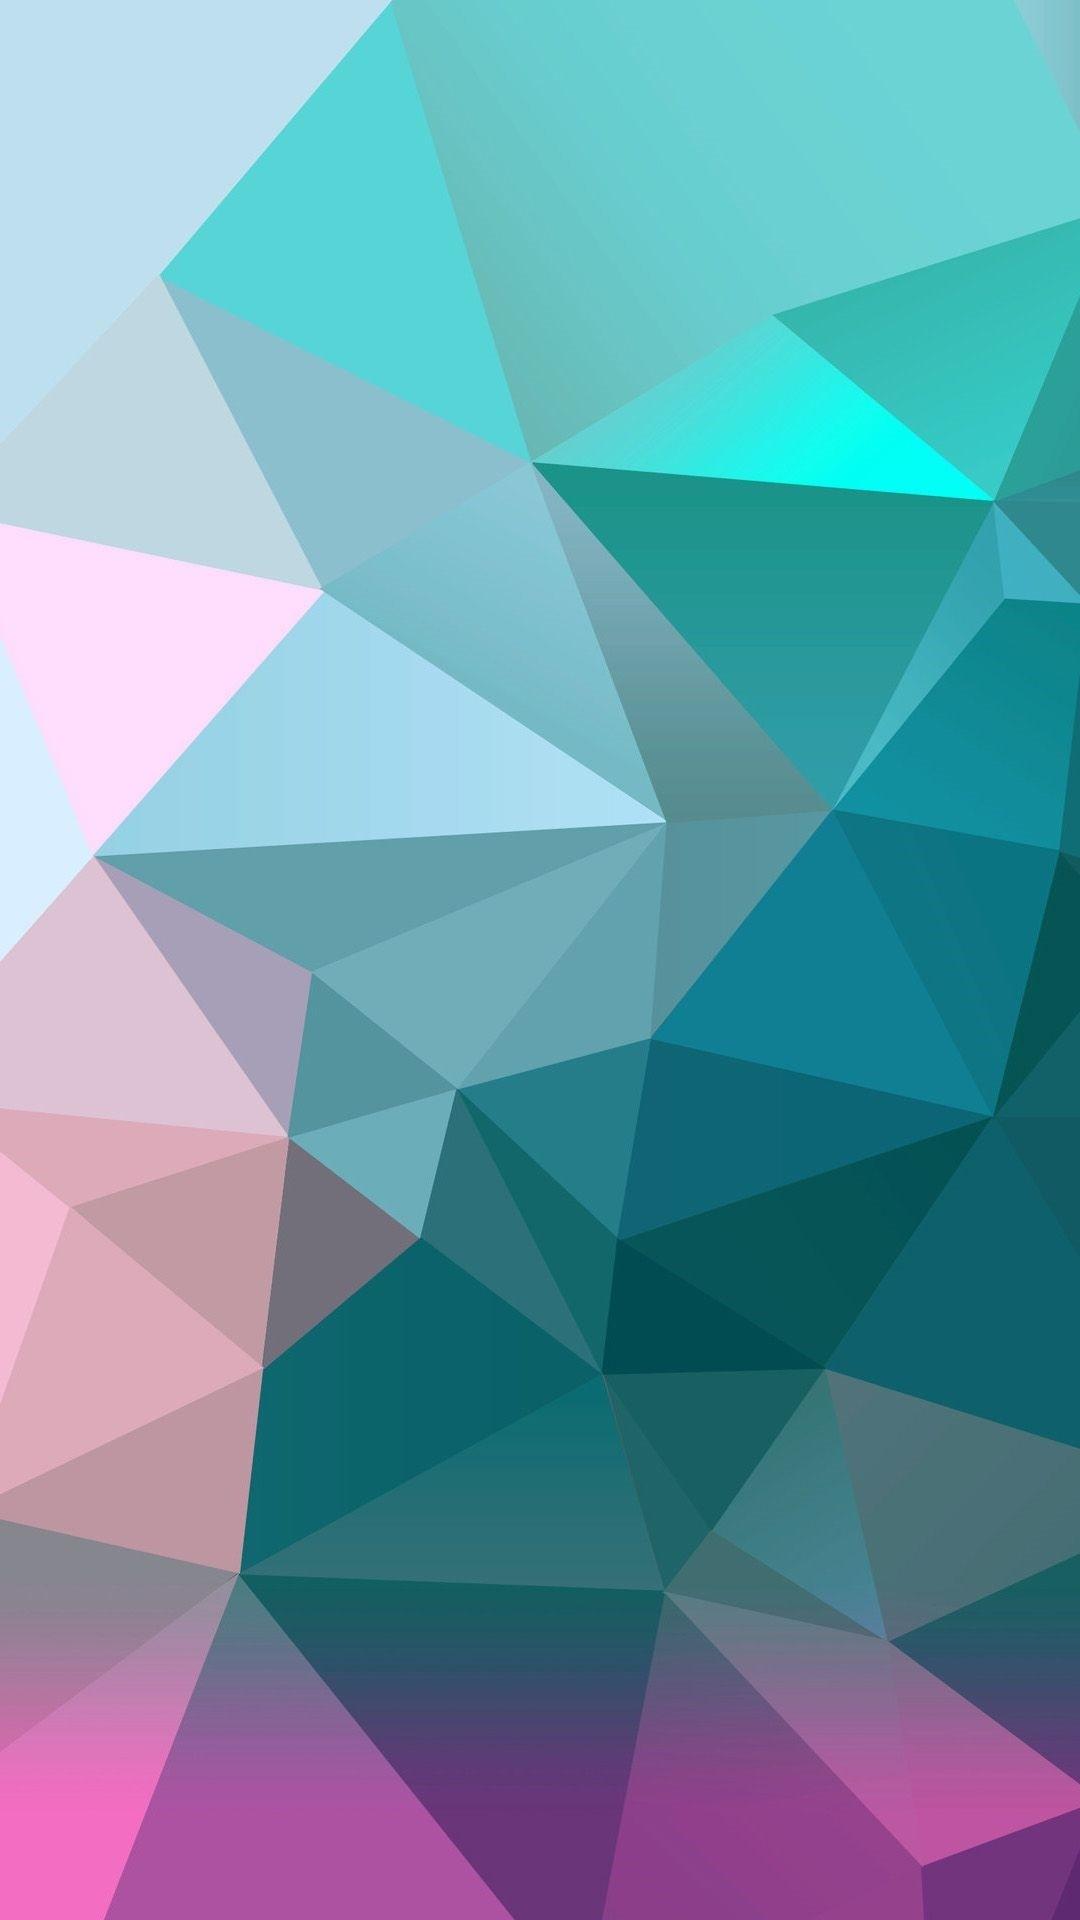 Geometric ios wallpaper